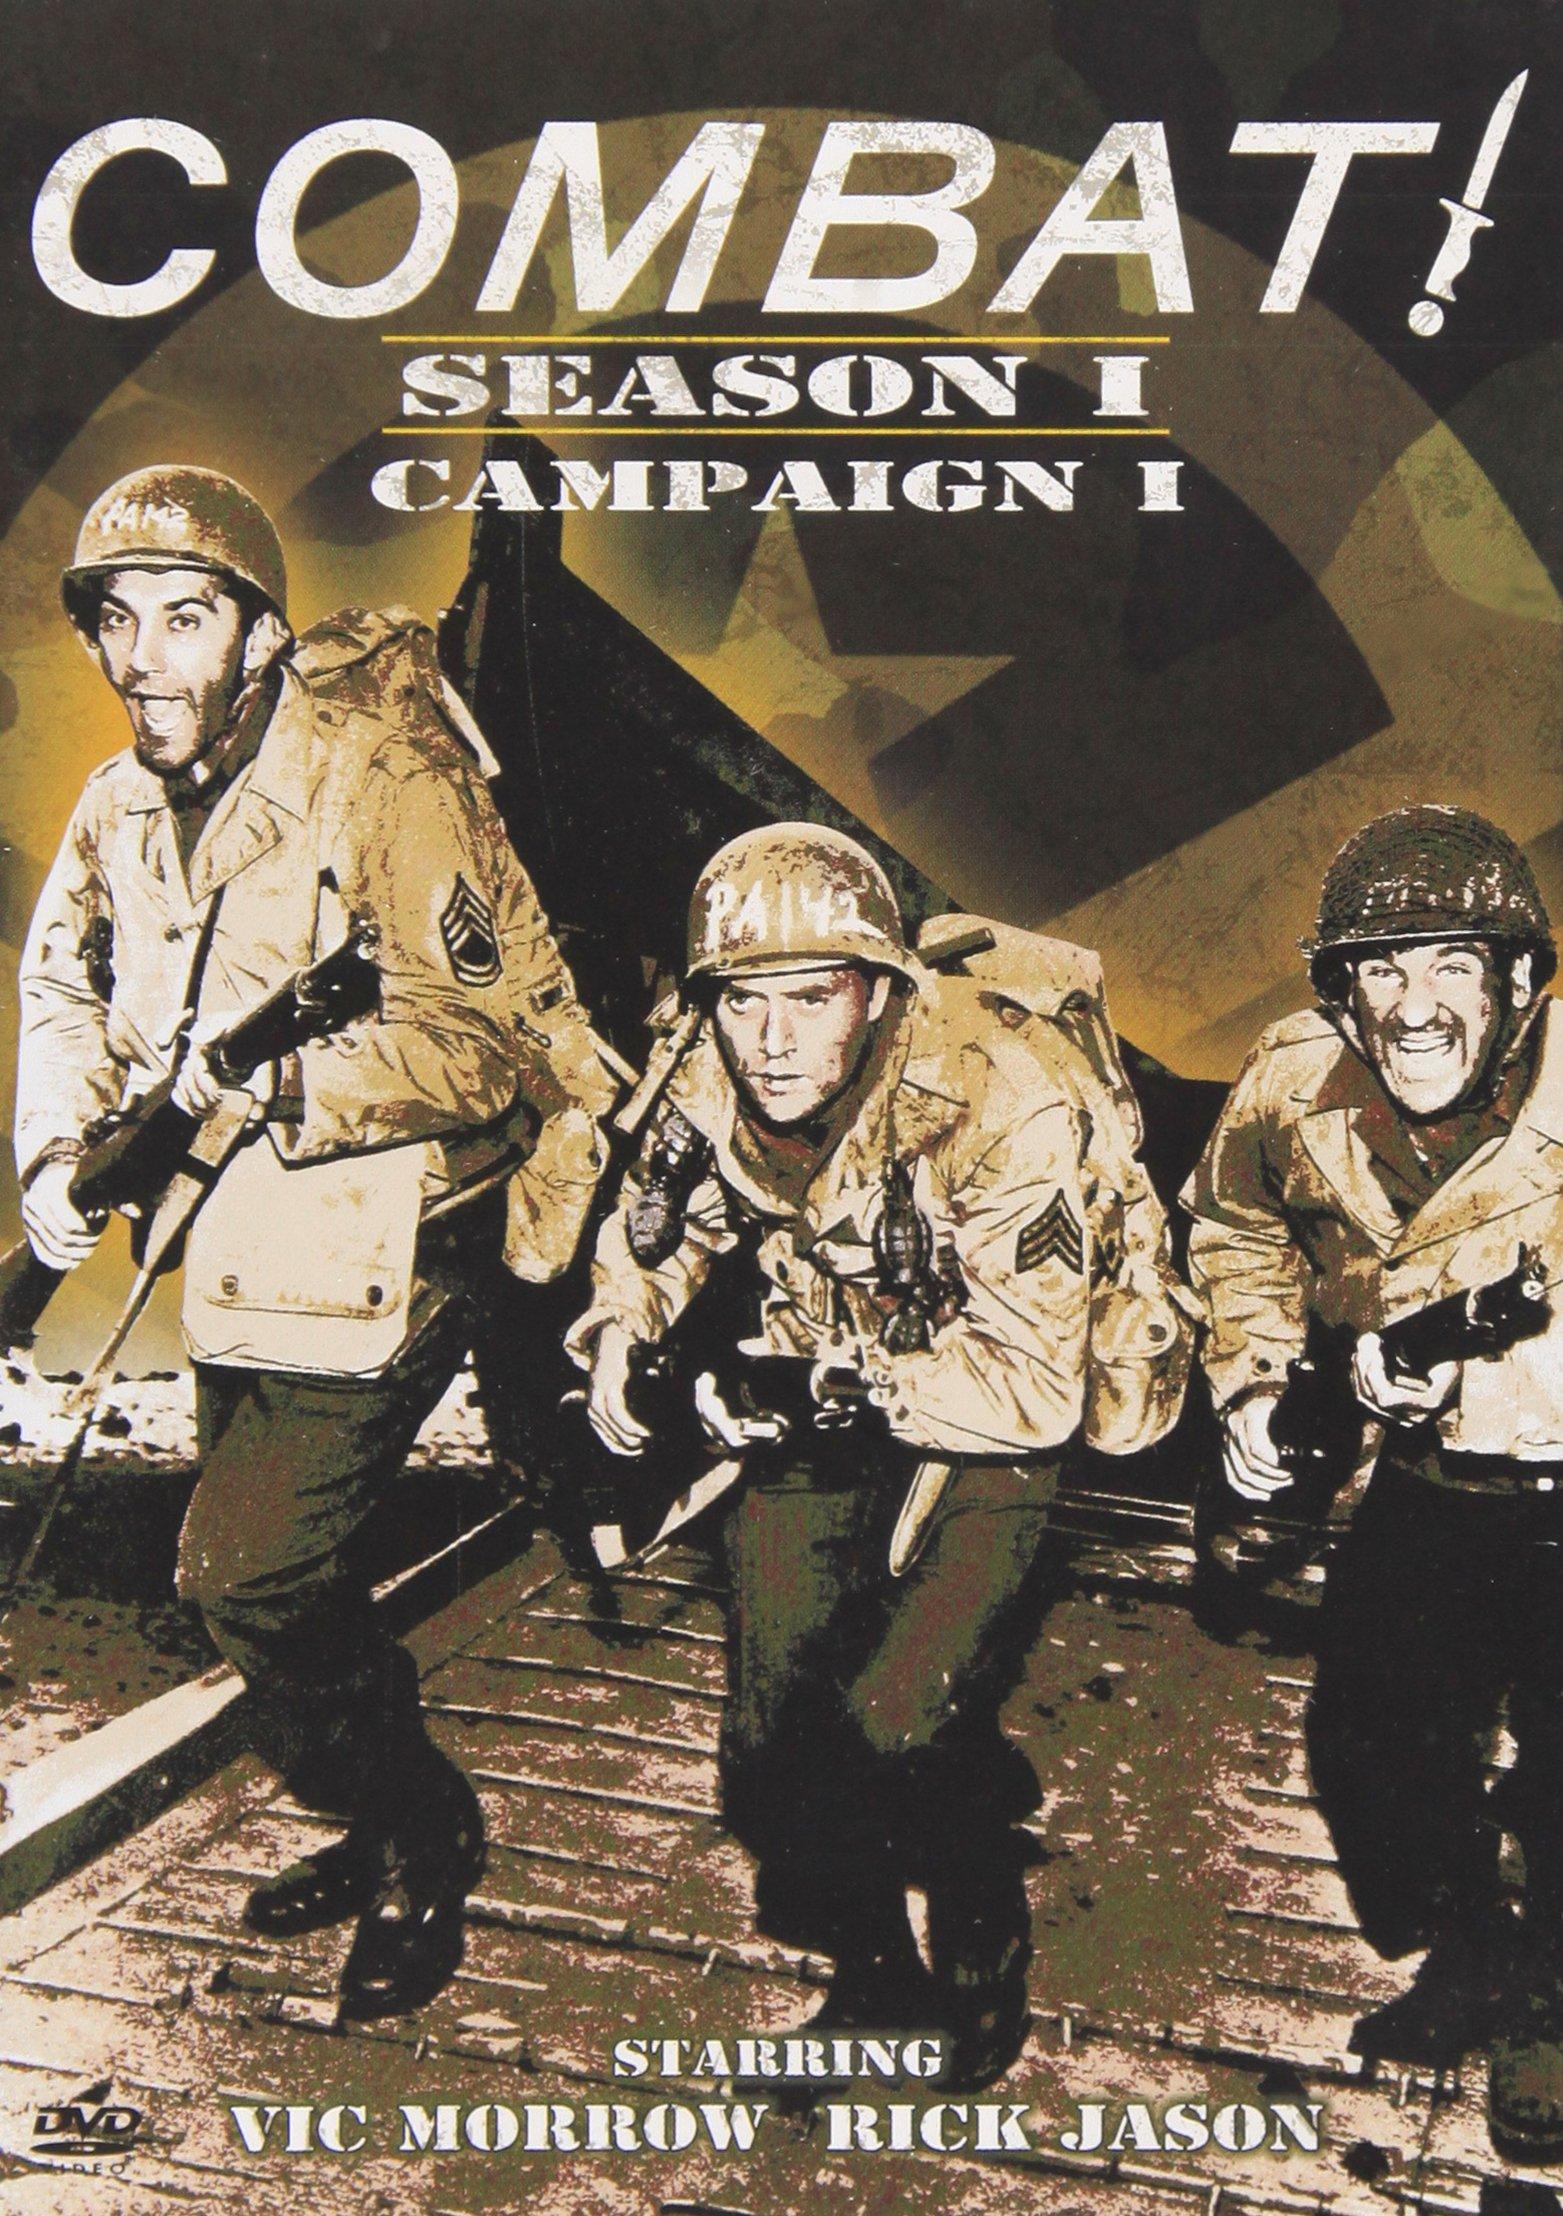 Combat - Season 1, Campaign 1 by Combat